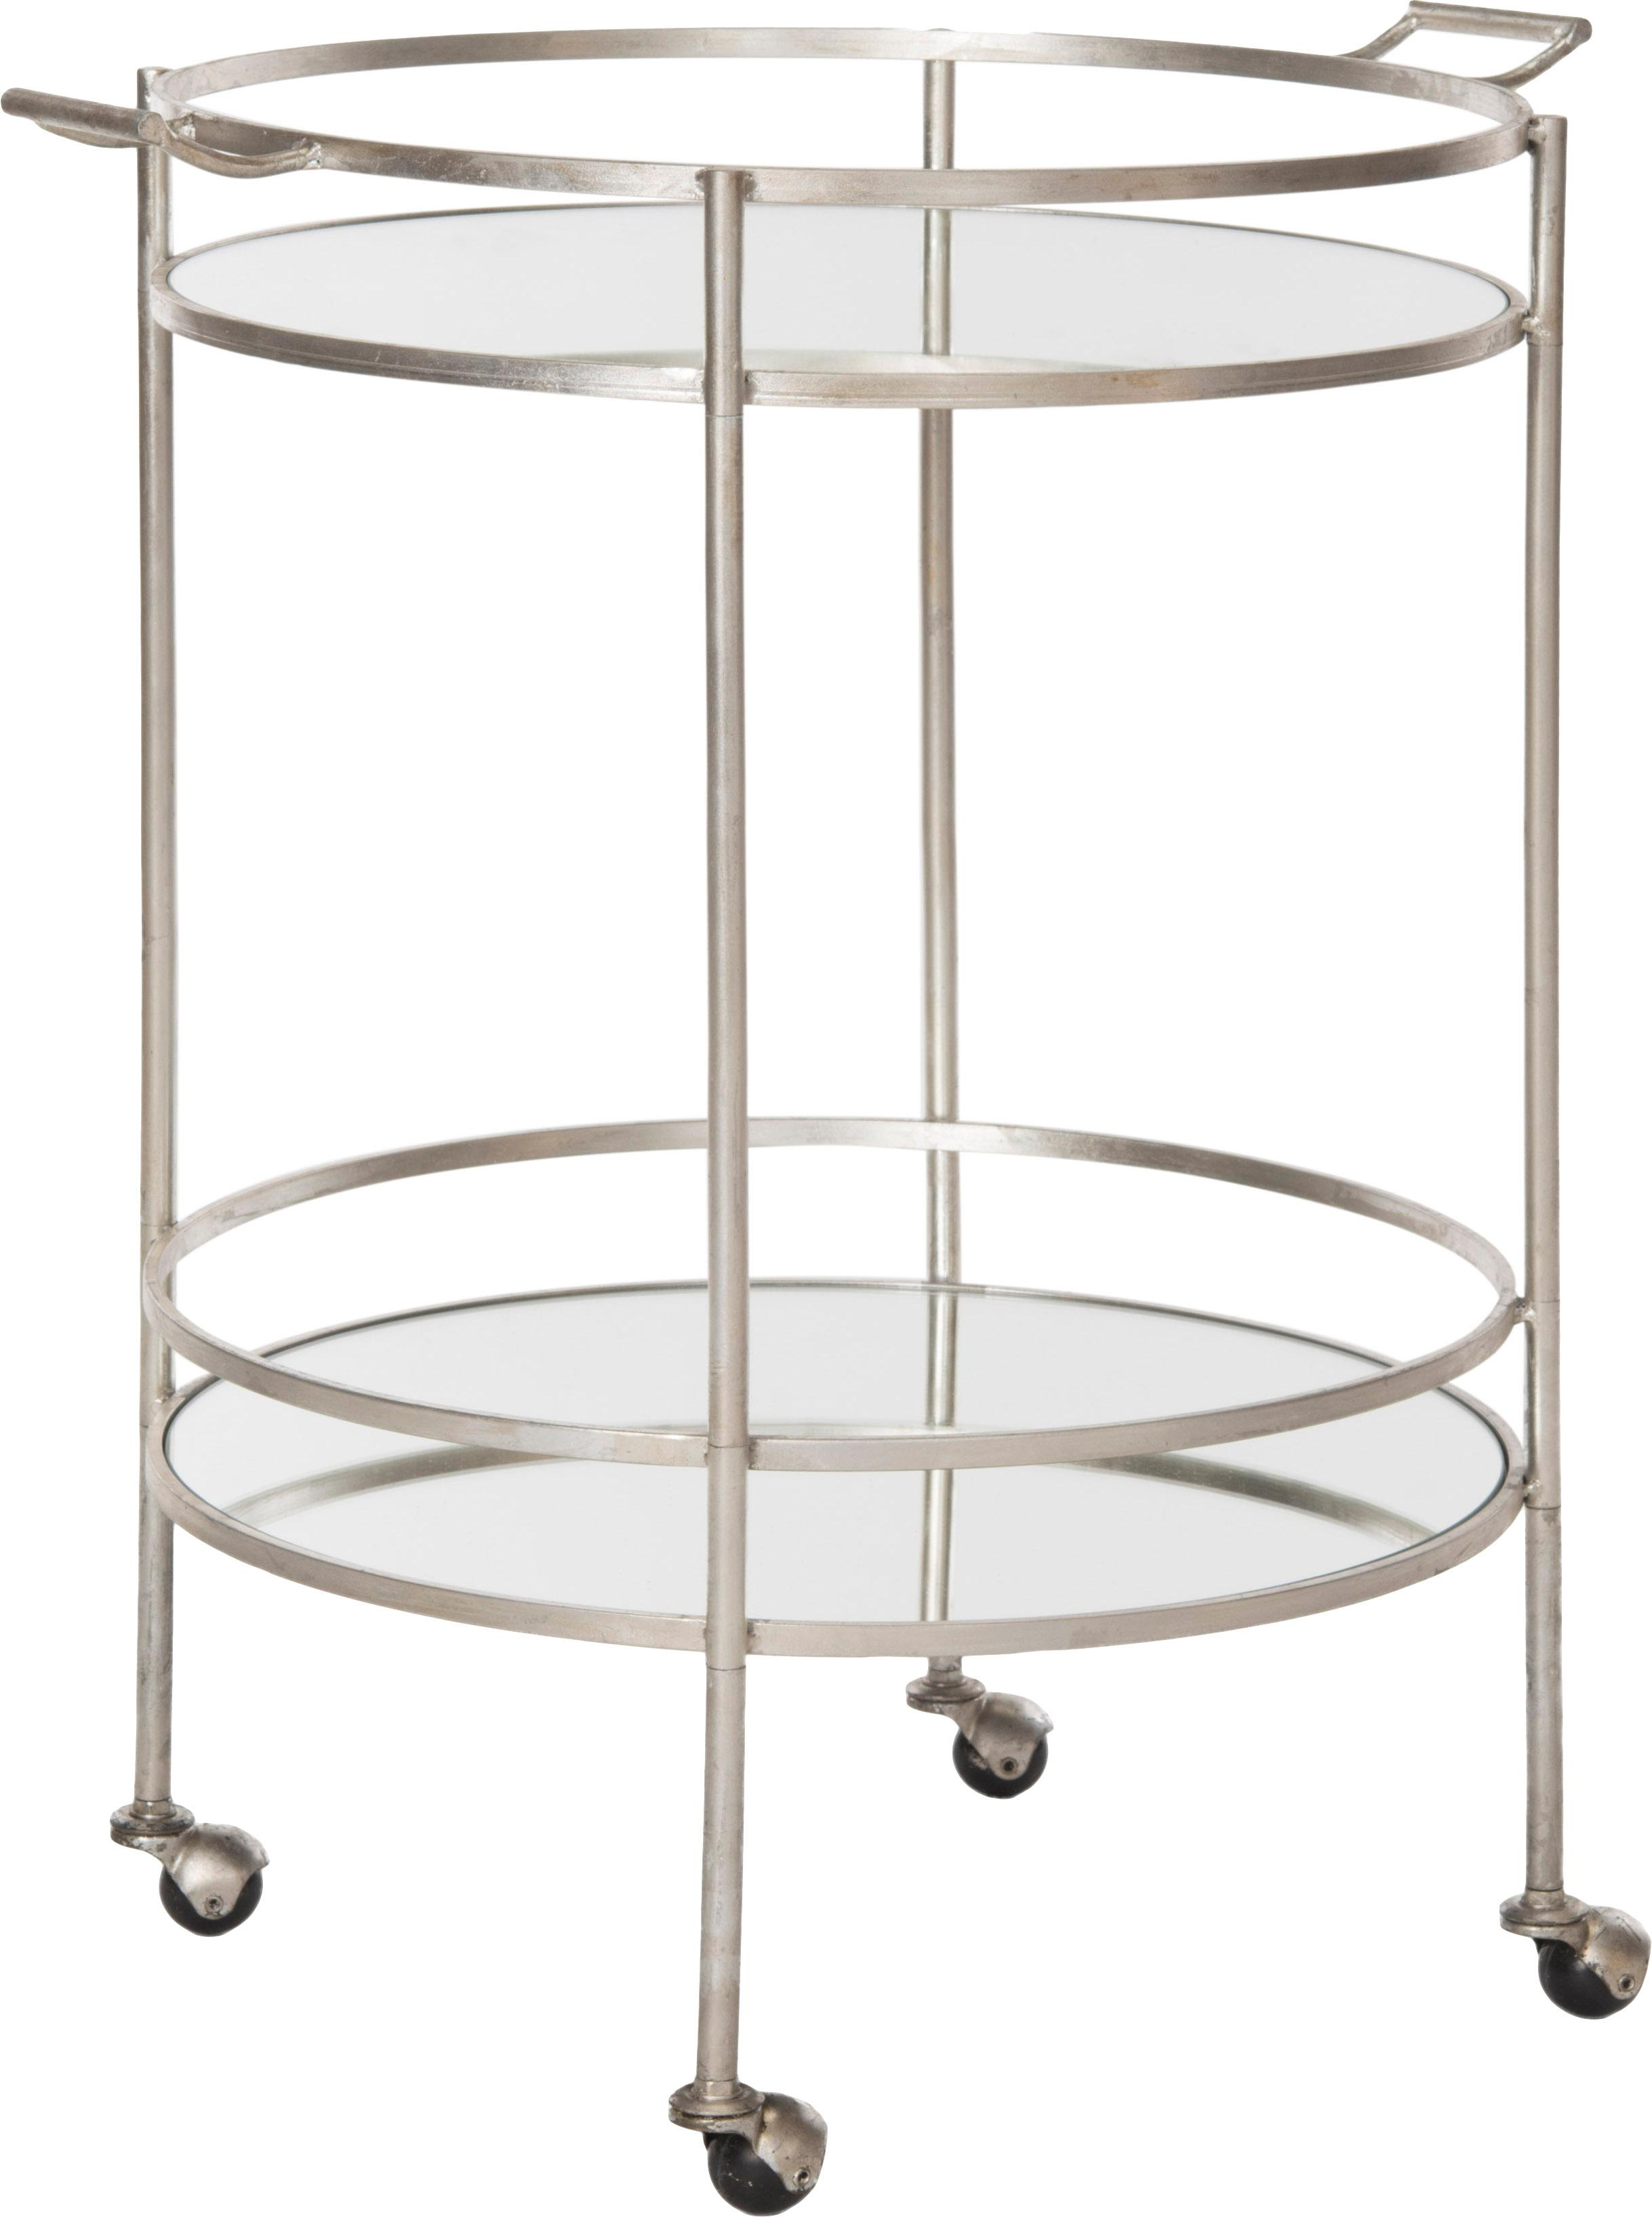 Metalen bar cart Harper, Frame: ijzer met antieke afwerki, Frame: metaalkleurig. Plateau: gespiegeld glas, B 64 x D 50 cm